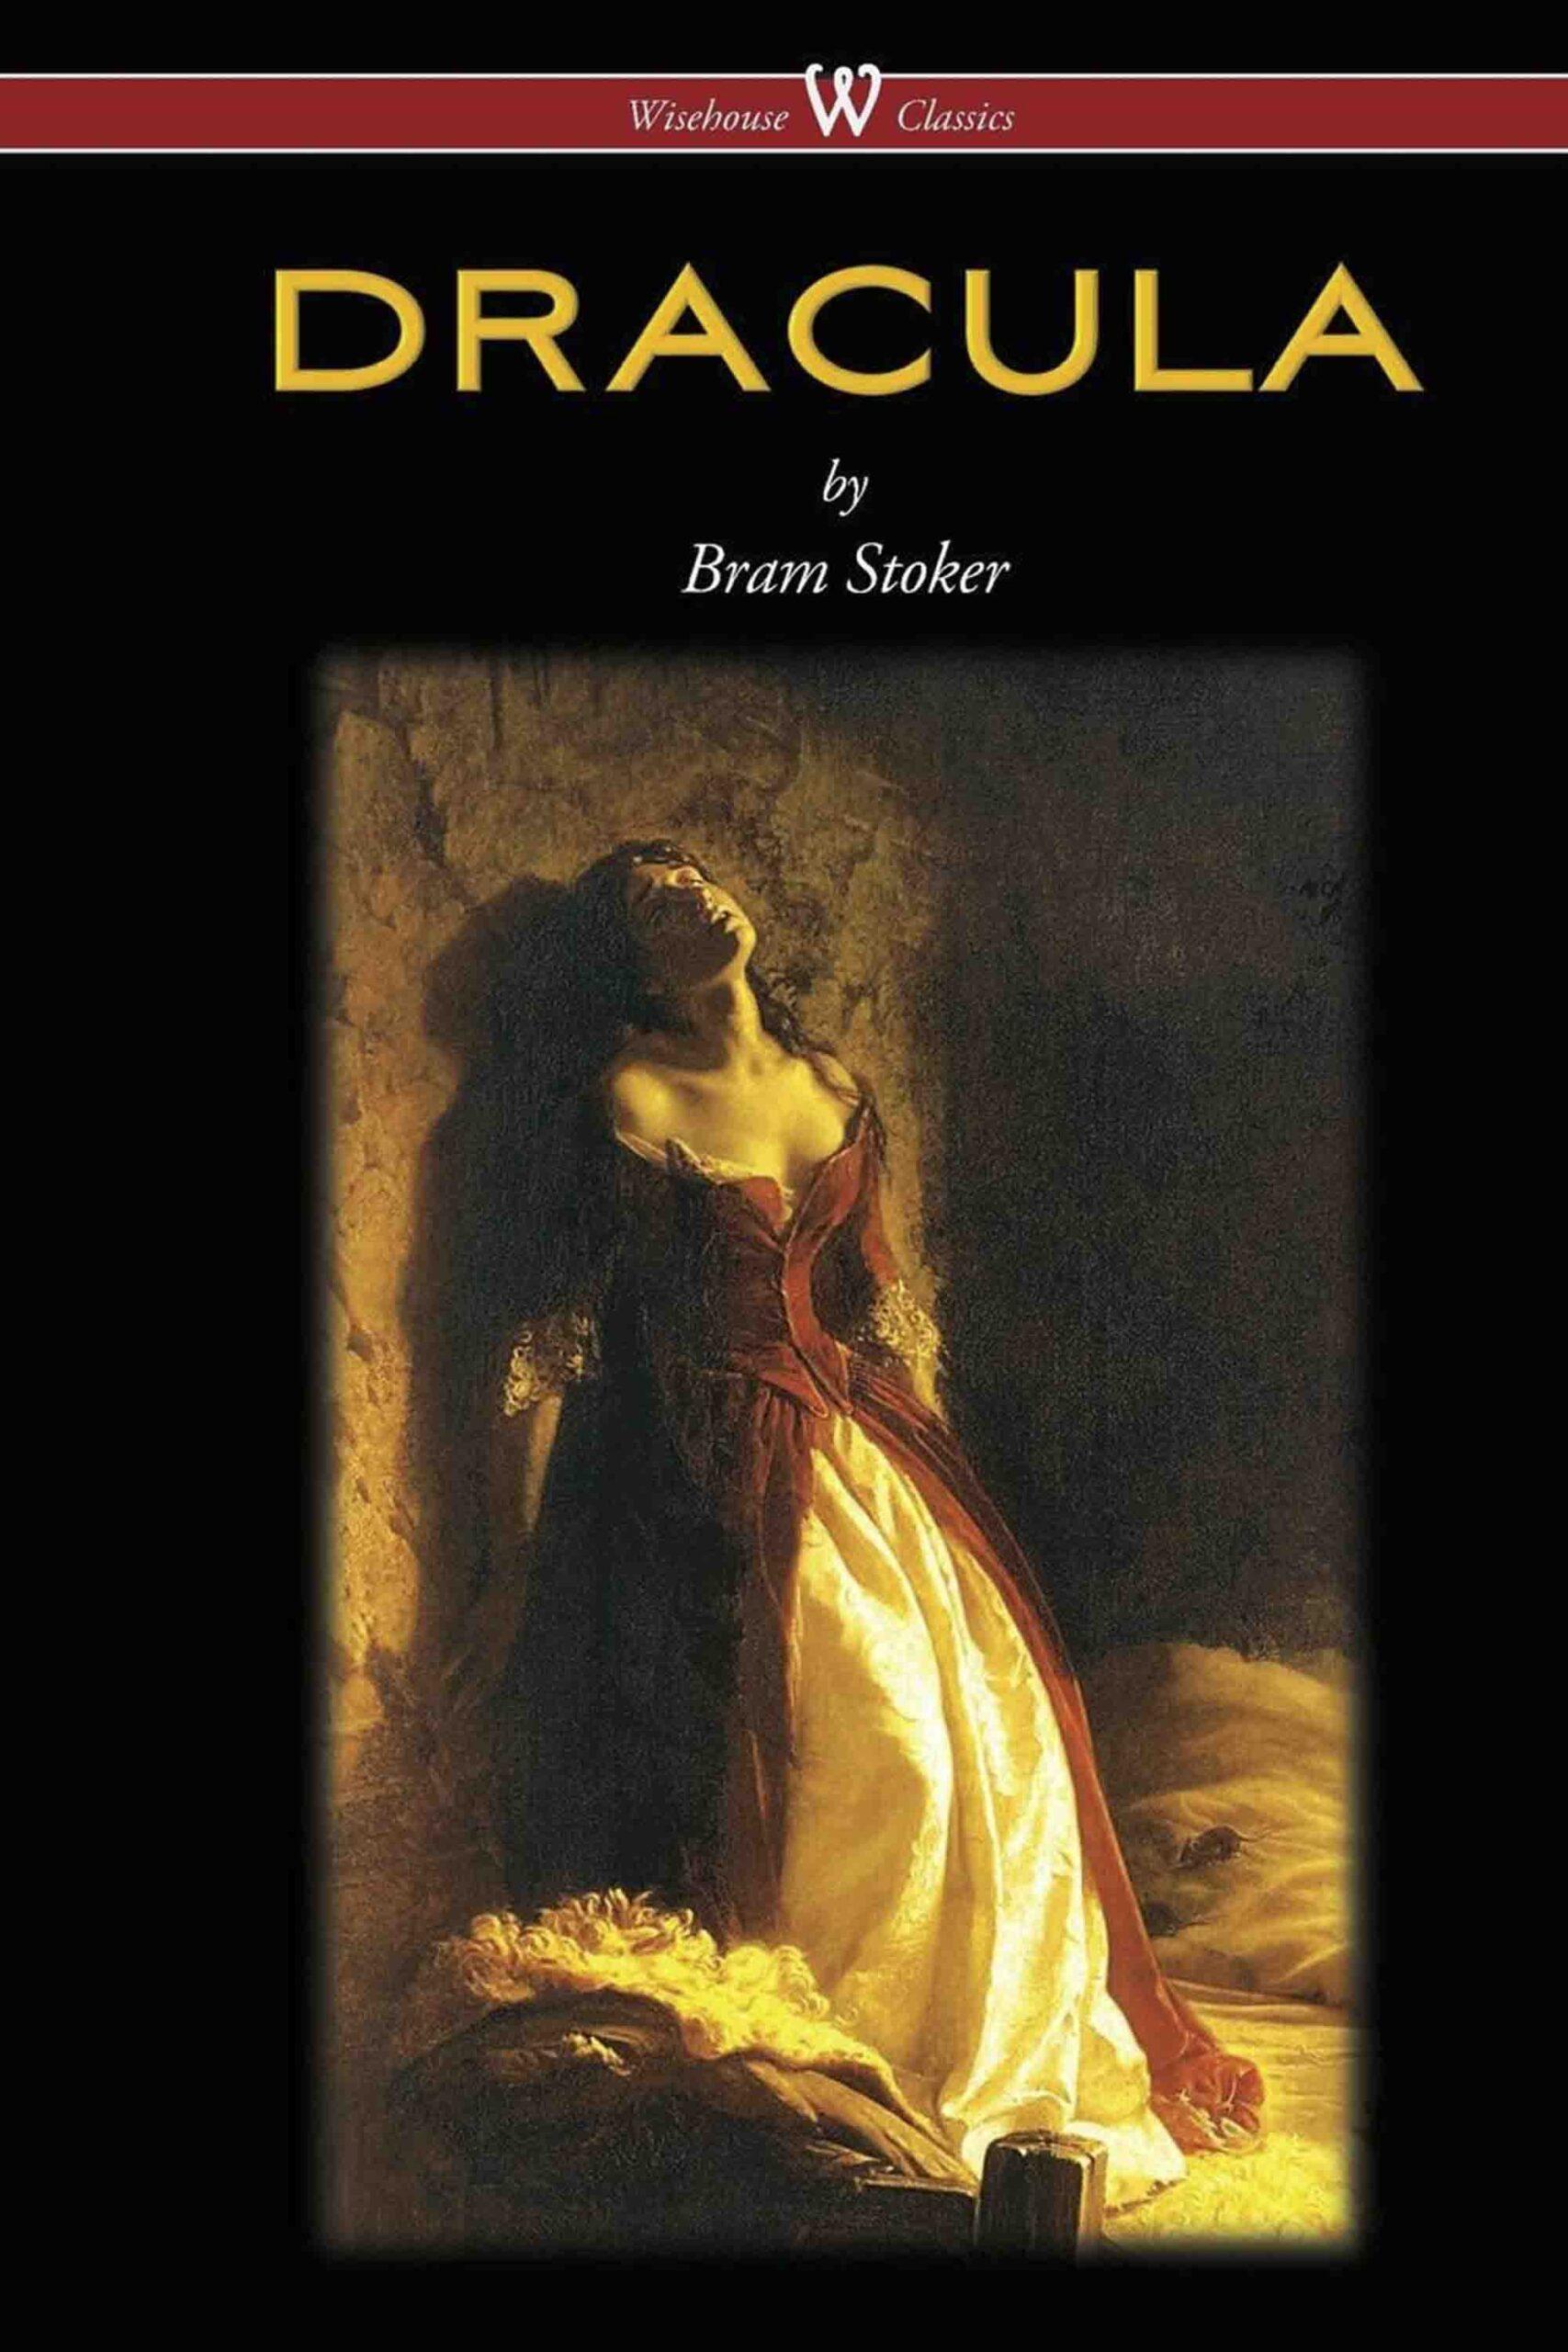 Dracula (Wisehouse Classics – The Original 1897 Edition)